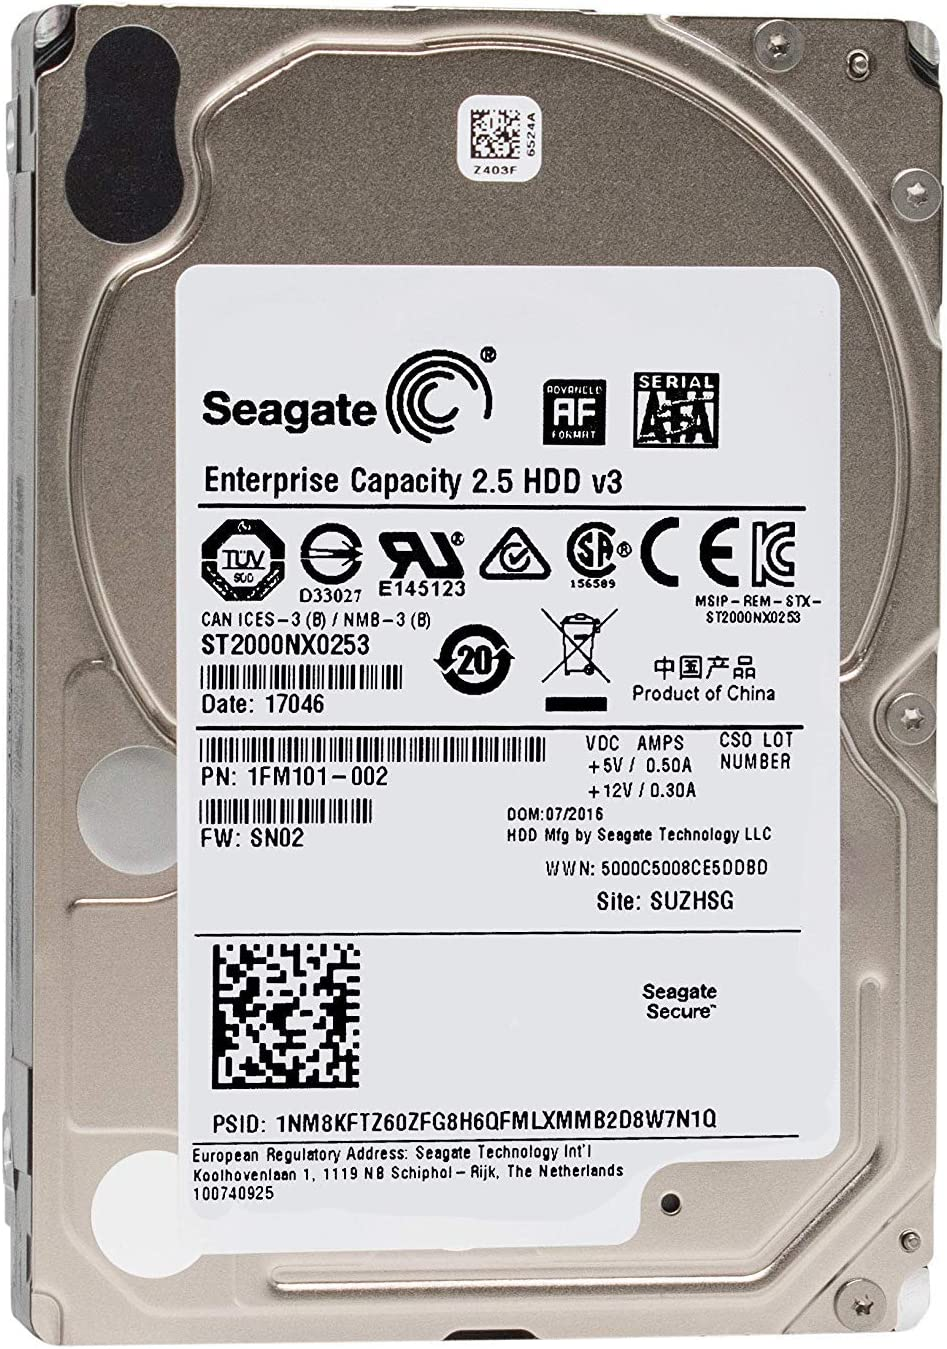 Seagate Enterprise Capacity 2.5 2TB 7200RPM SATA 6Gb/s 2.5-Inch Hard Drive (ST2000NX0253)